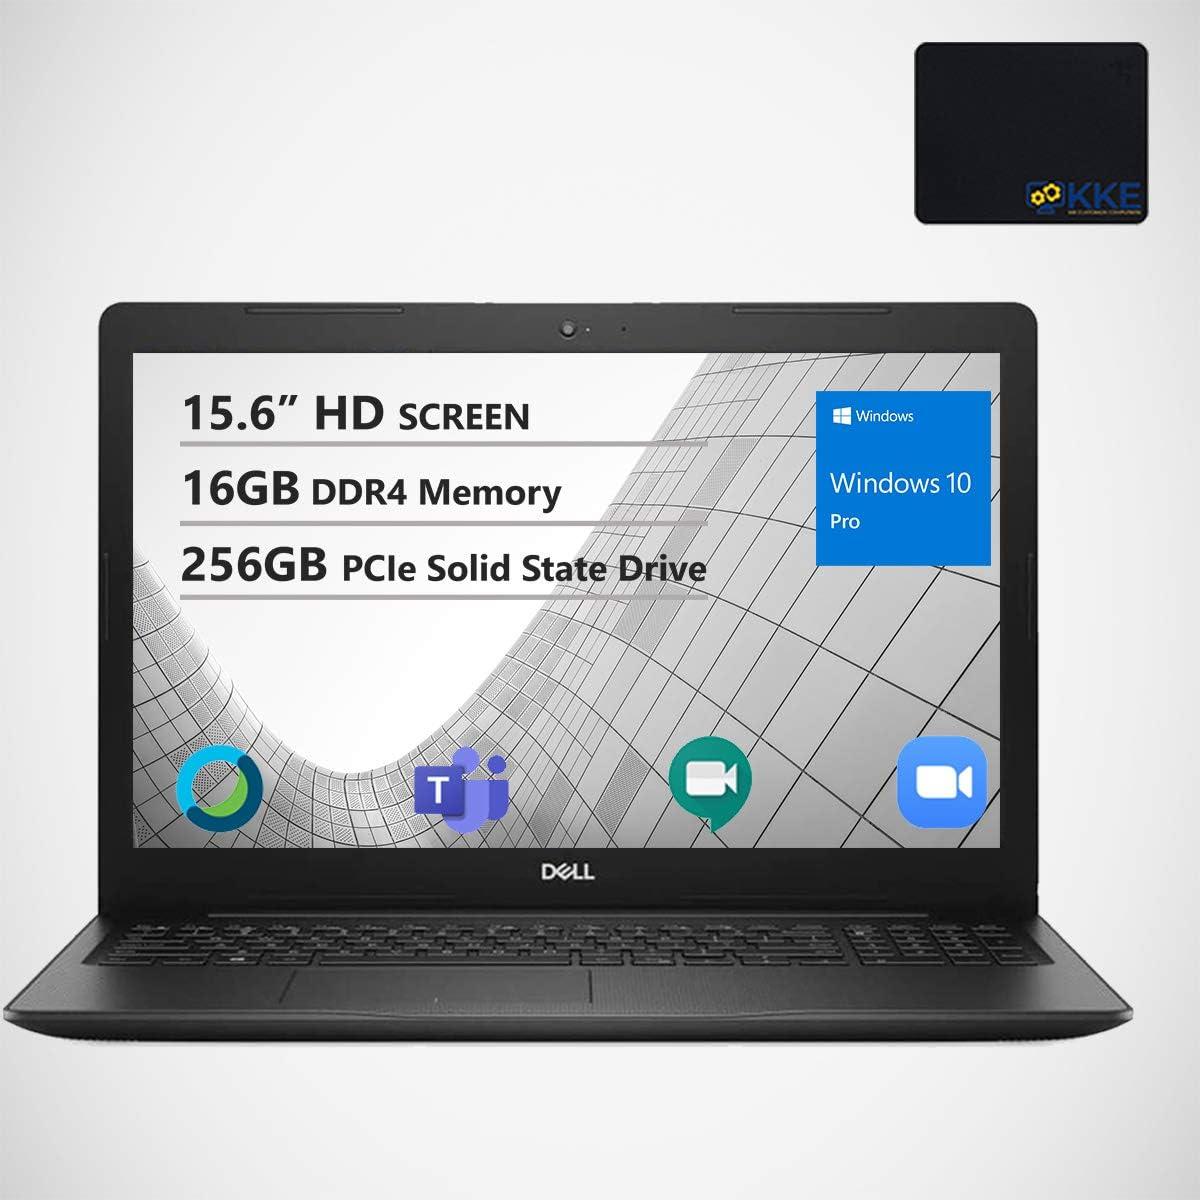 "Dell Inspiron 15.6"" HD Business Laptop, Intel 4205U, 16GB RAM, 256GB PCIe SSD, Webcam, WiFi, KKE Mousepad, Bluetooth, Win10 Pro, Black"